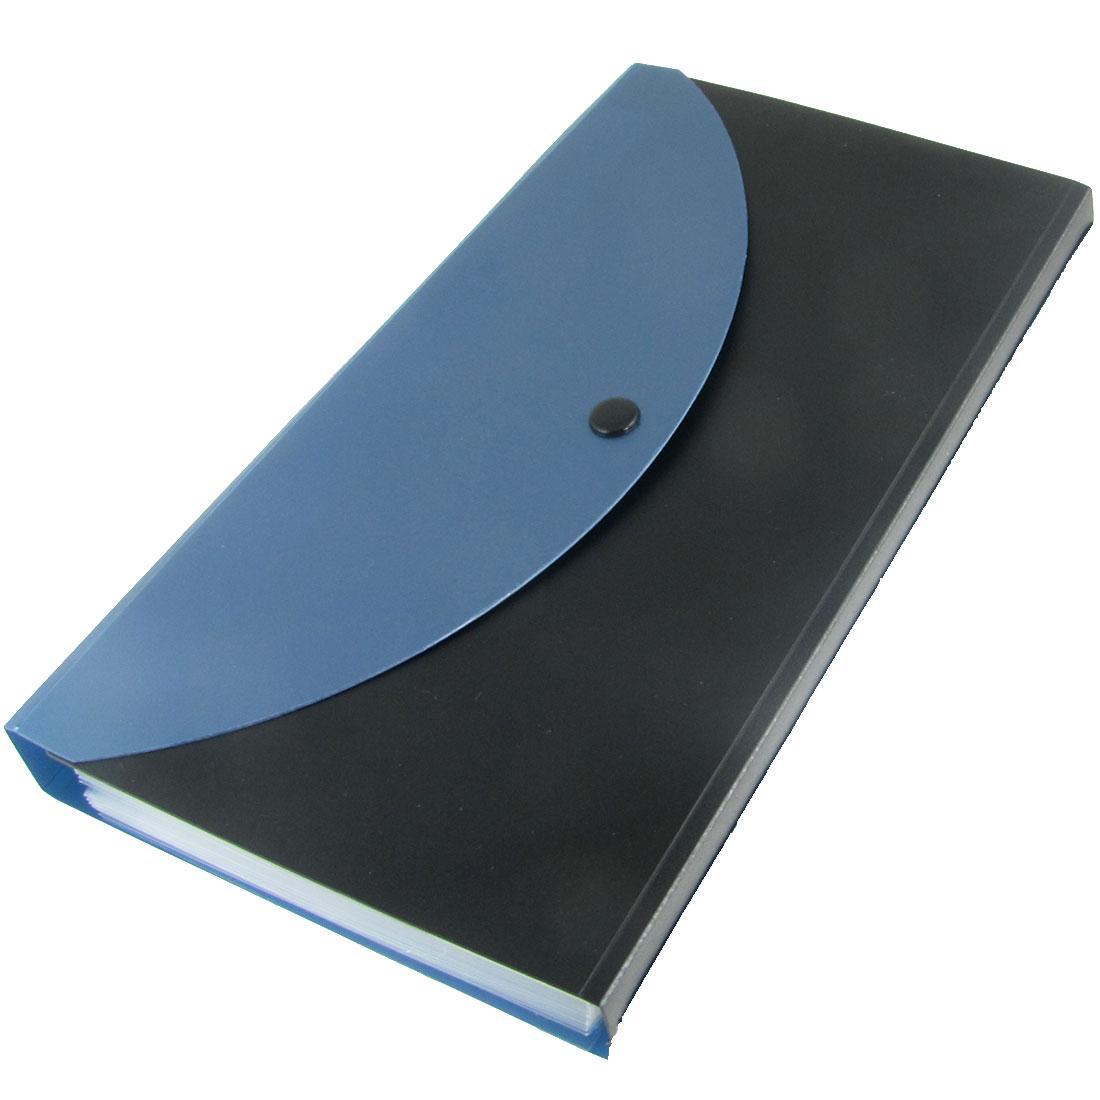 13 Compartments Plastic Blue Black Rectangle Cover Button Closure Letters Stickers File Folder